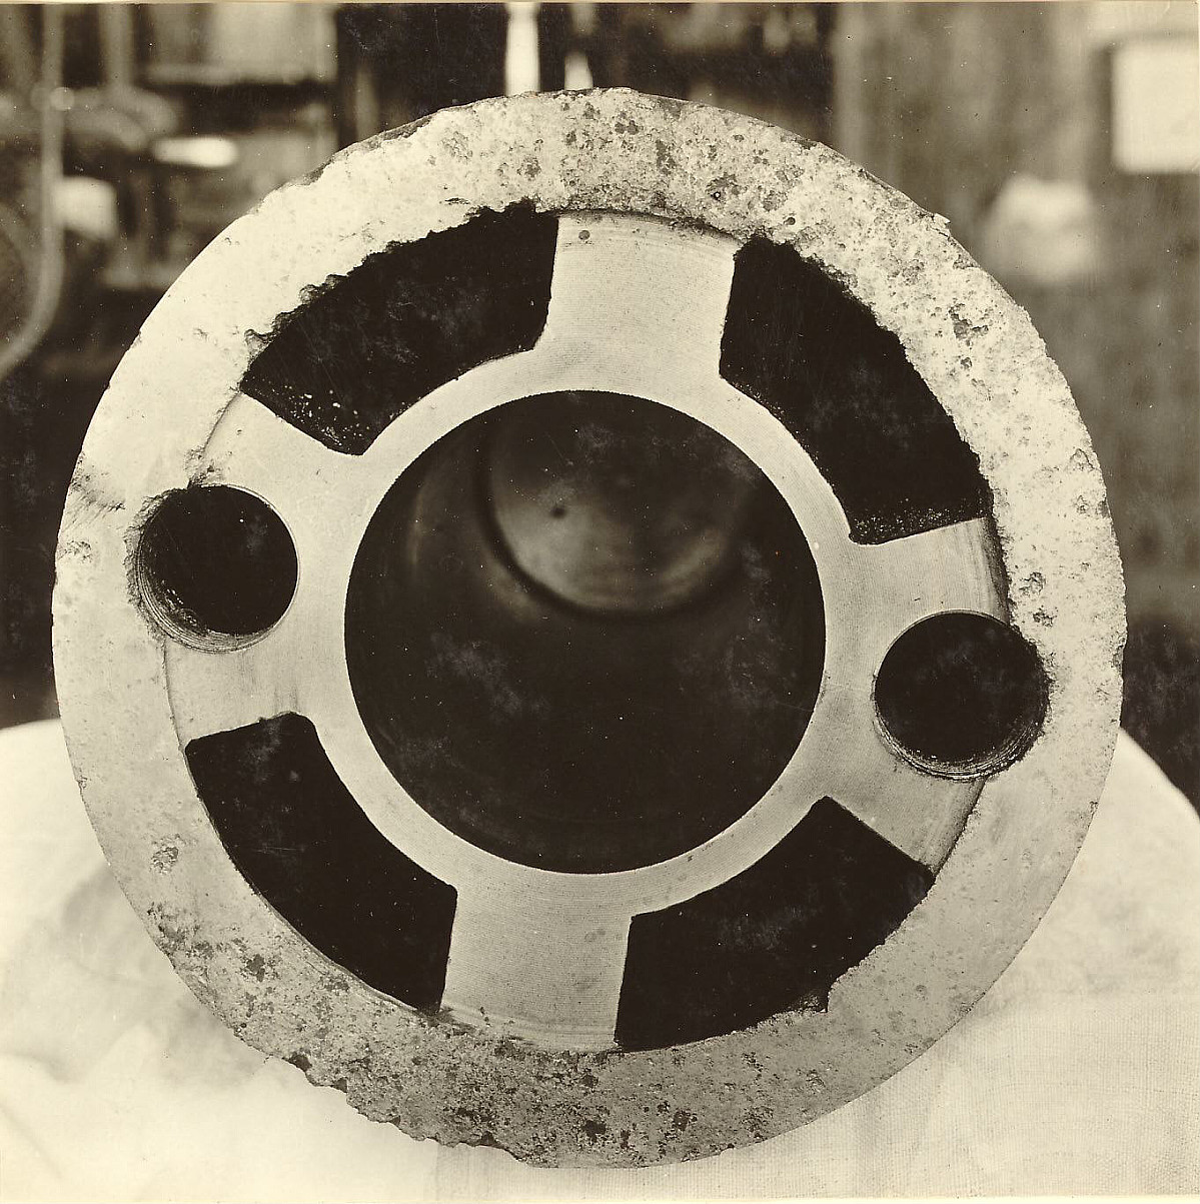 GFA 24/53.1180: Nicholls moulding machine